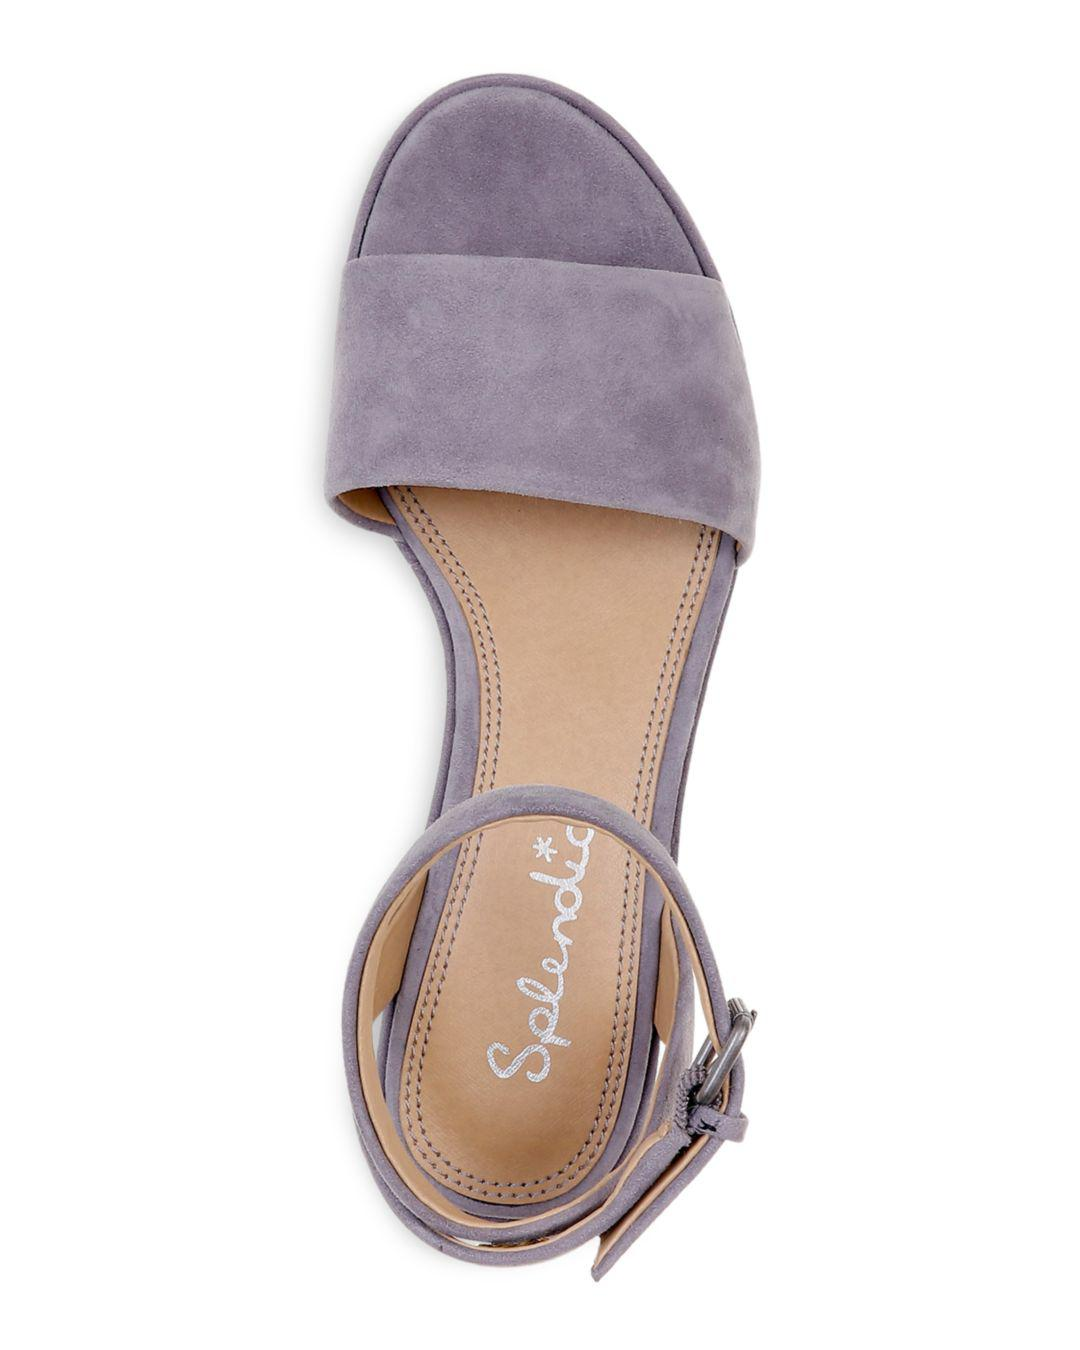 b673a0f32d91 Lyst - Splendid Women s Felix Suede Ankle Strap Platform Wedge Sandals